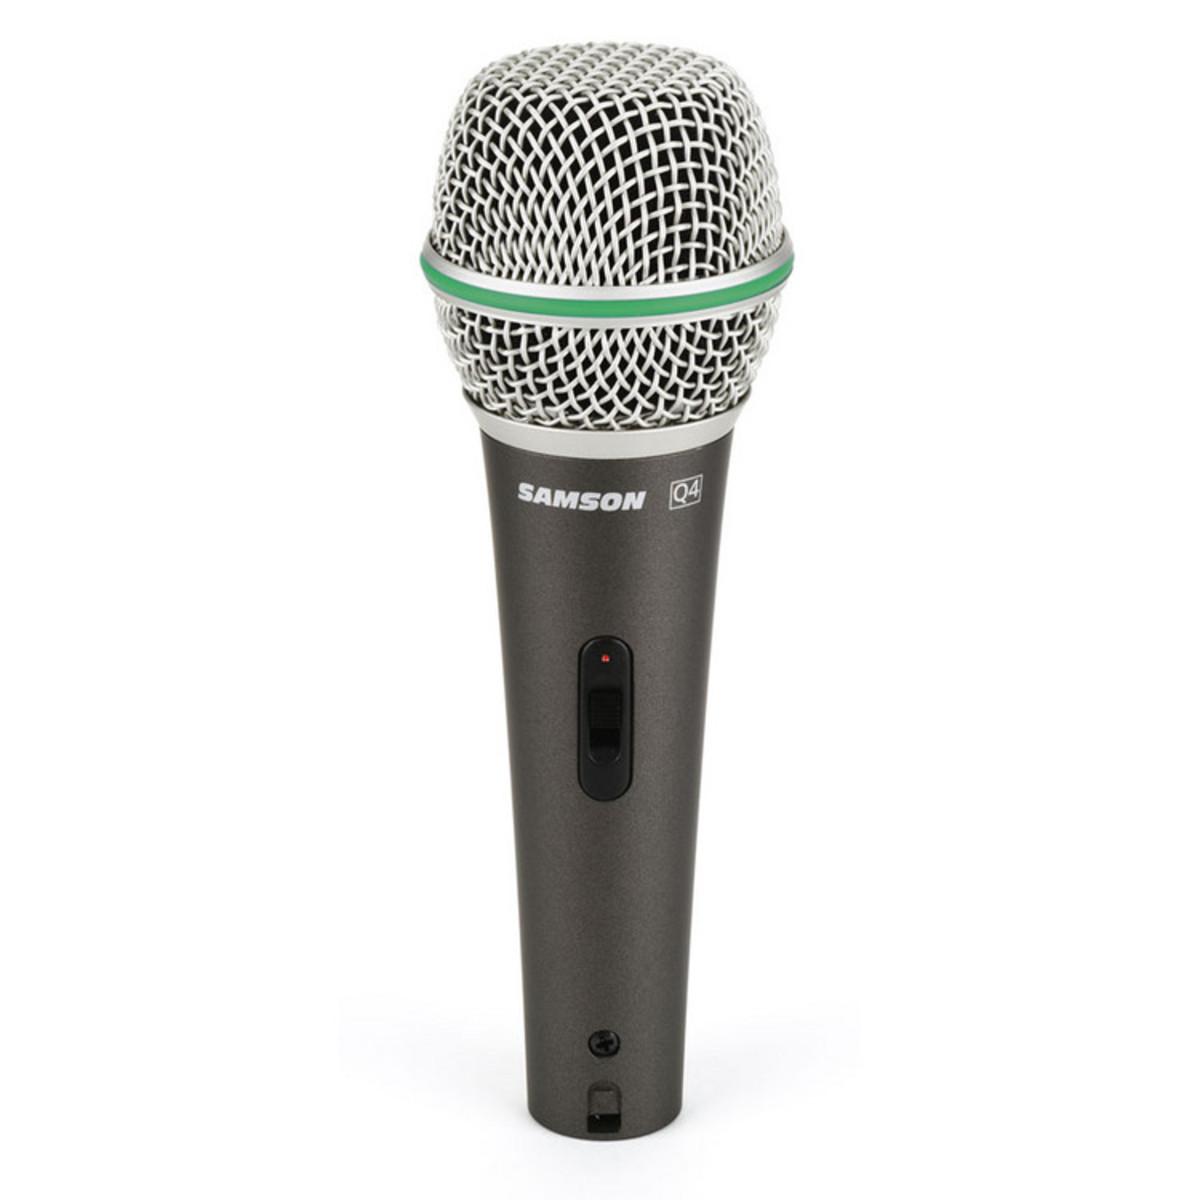 samson q4 cl dynamic microphone at gear4music. Black Bedroom Furniture Sets. Home Design Ideas